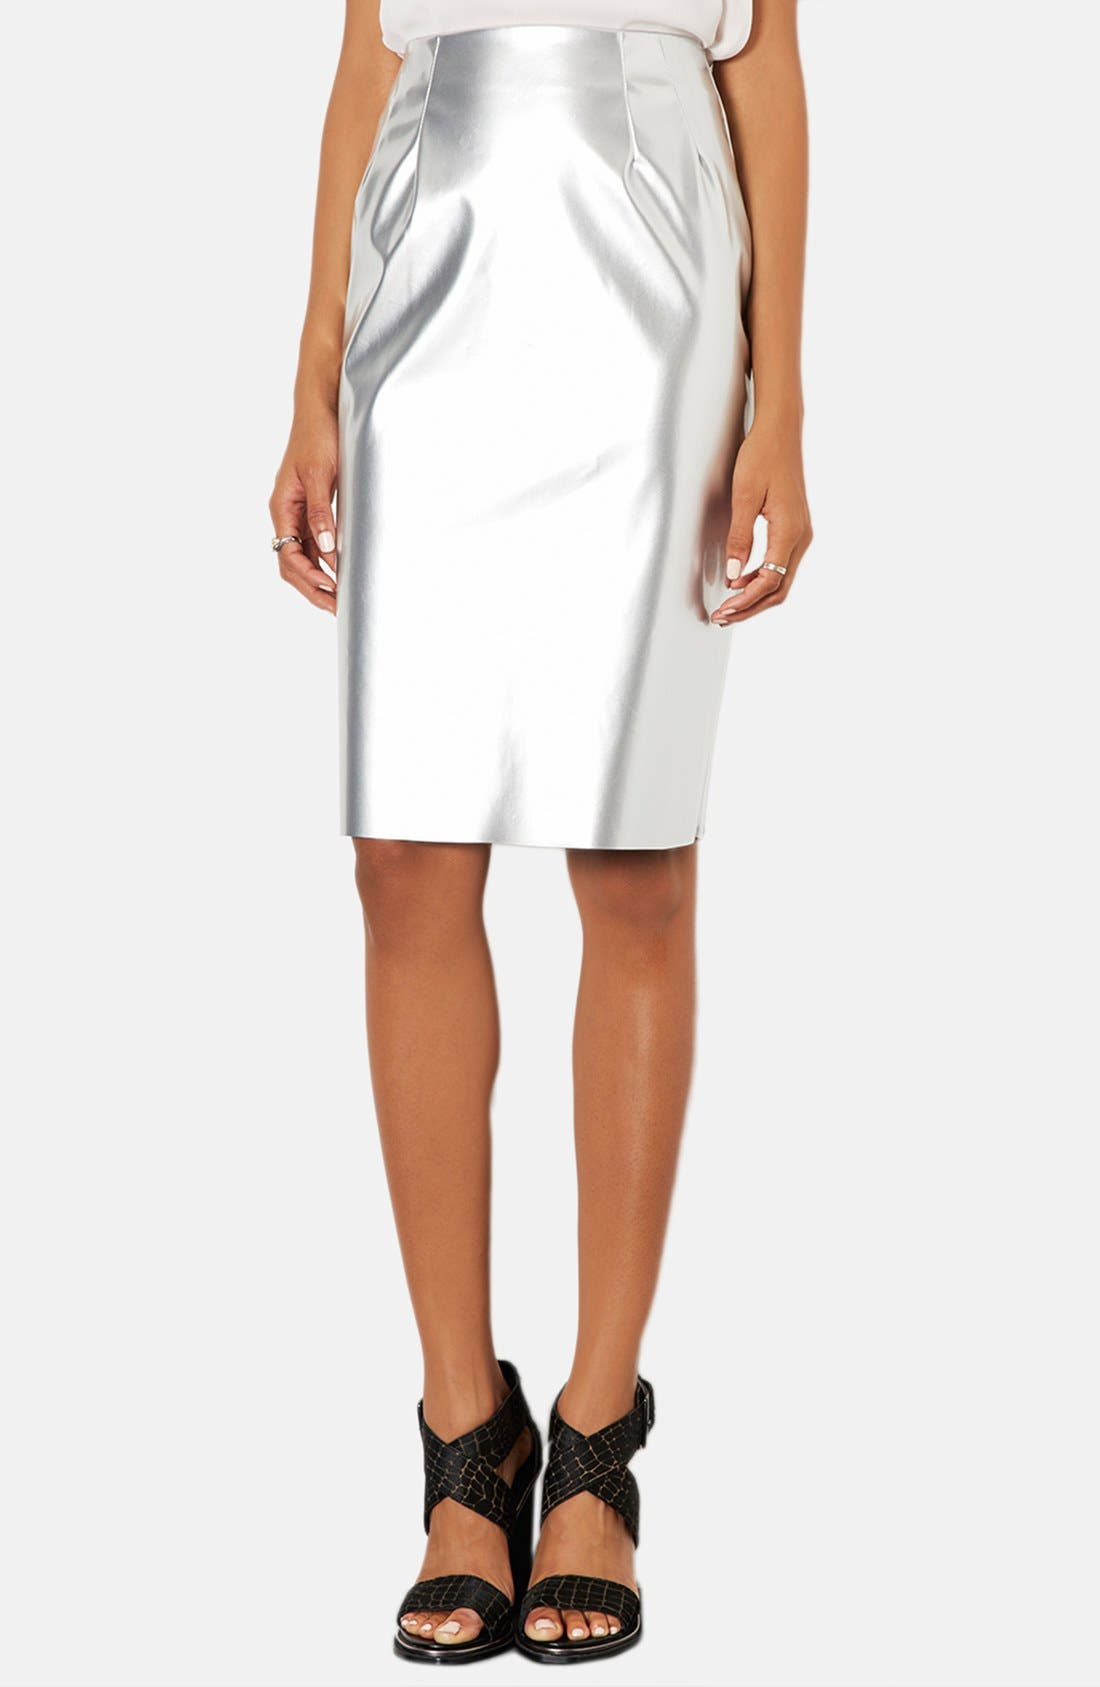 Alternate Image 1 Selected - Topshop Metallic Pencil Skirt